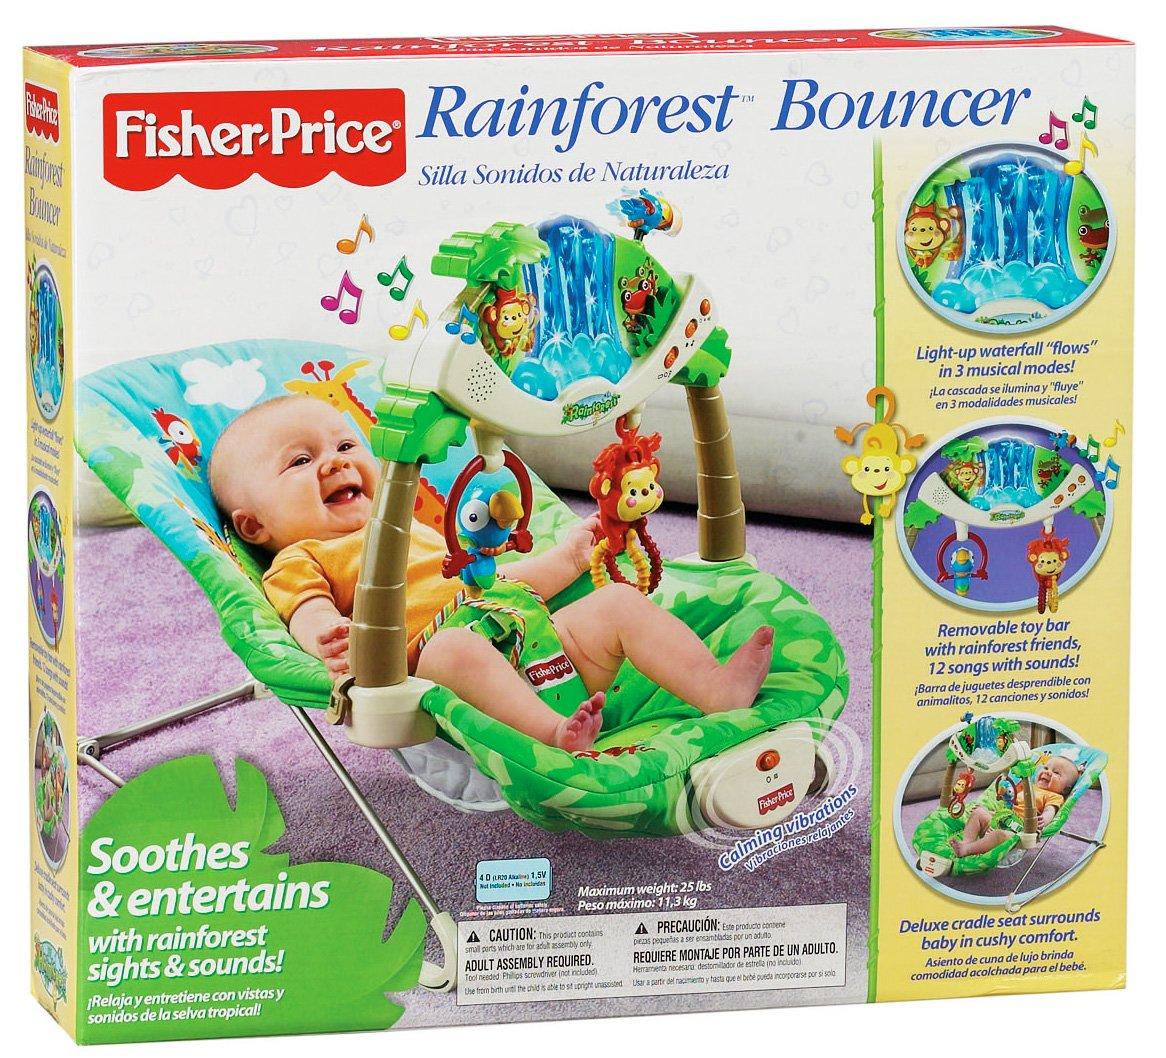 amazon com fisher price rainforest bouncer infant bouncers and rh amazon com Fisher-Price Rainforest Jumperoo Fisher-Price Rainforest Friends